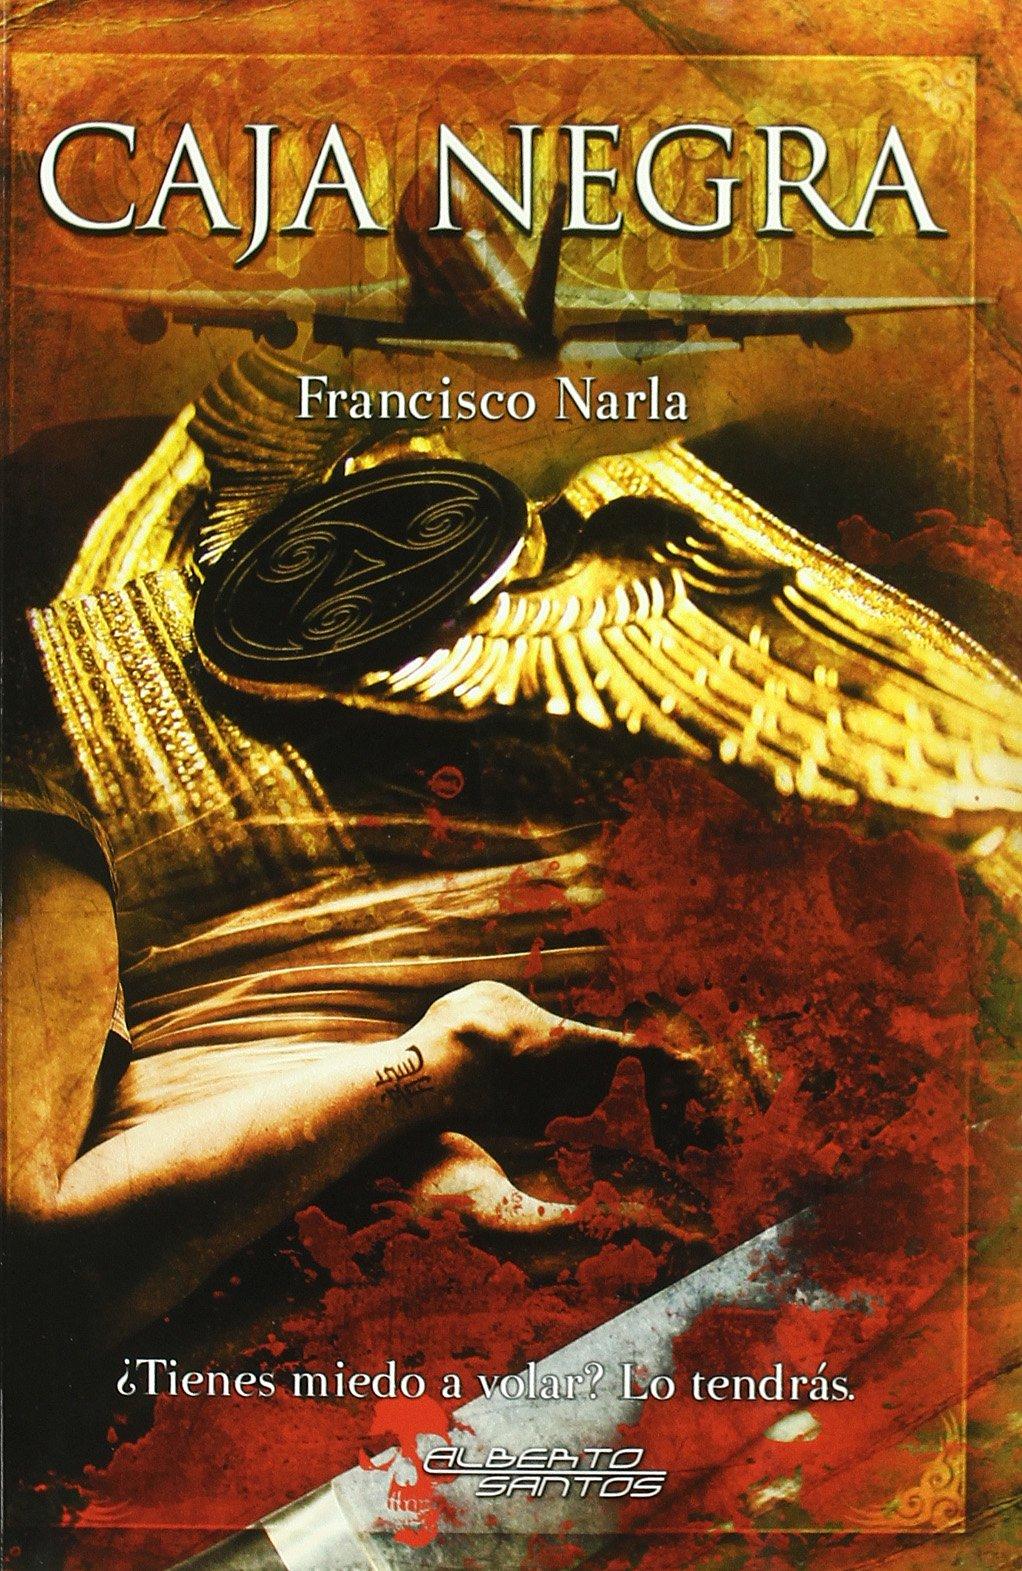 Caja negra (Narrativa fantástica): Amazon.es: Narla, Francisco: Libros